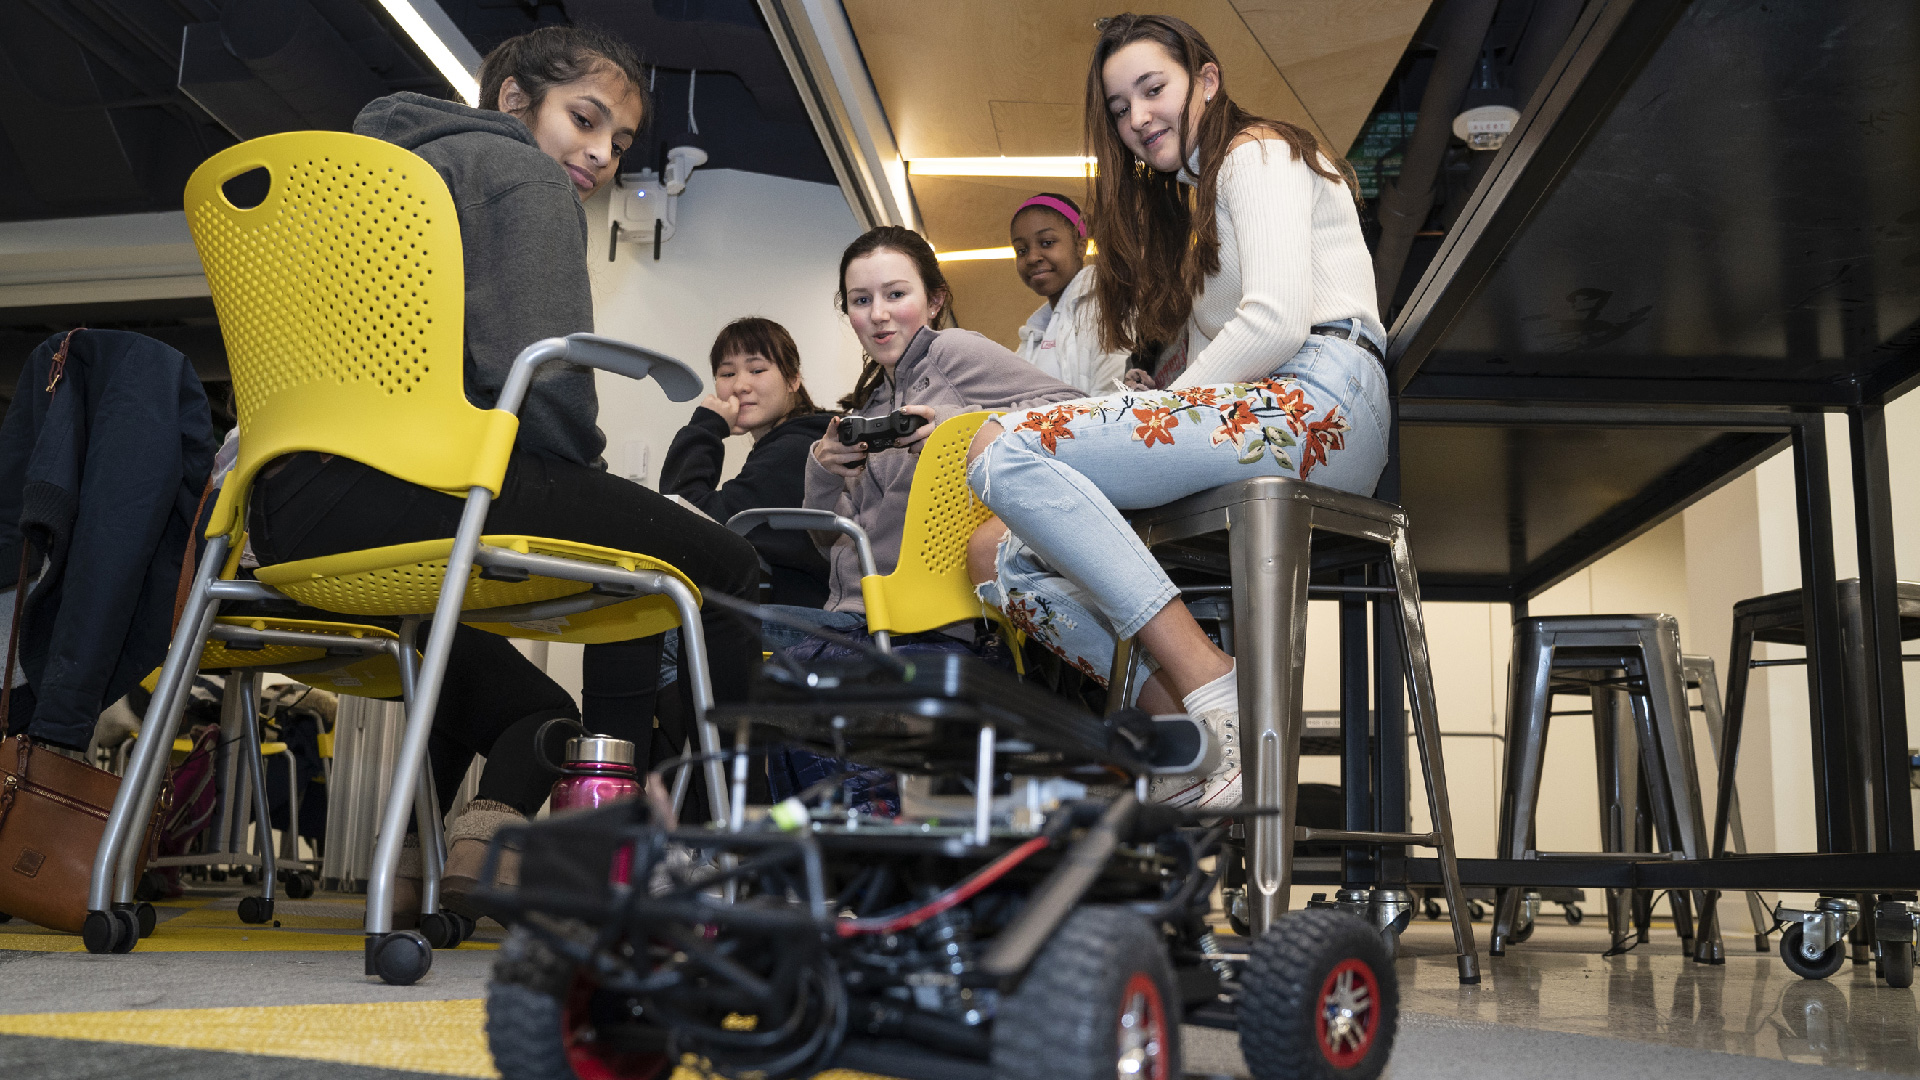 Girls program robots in high school